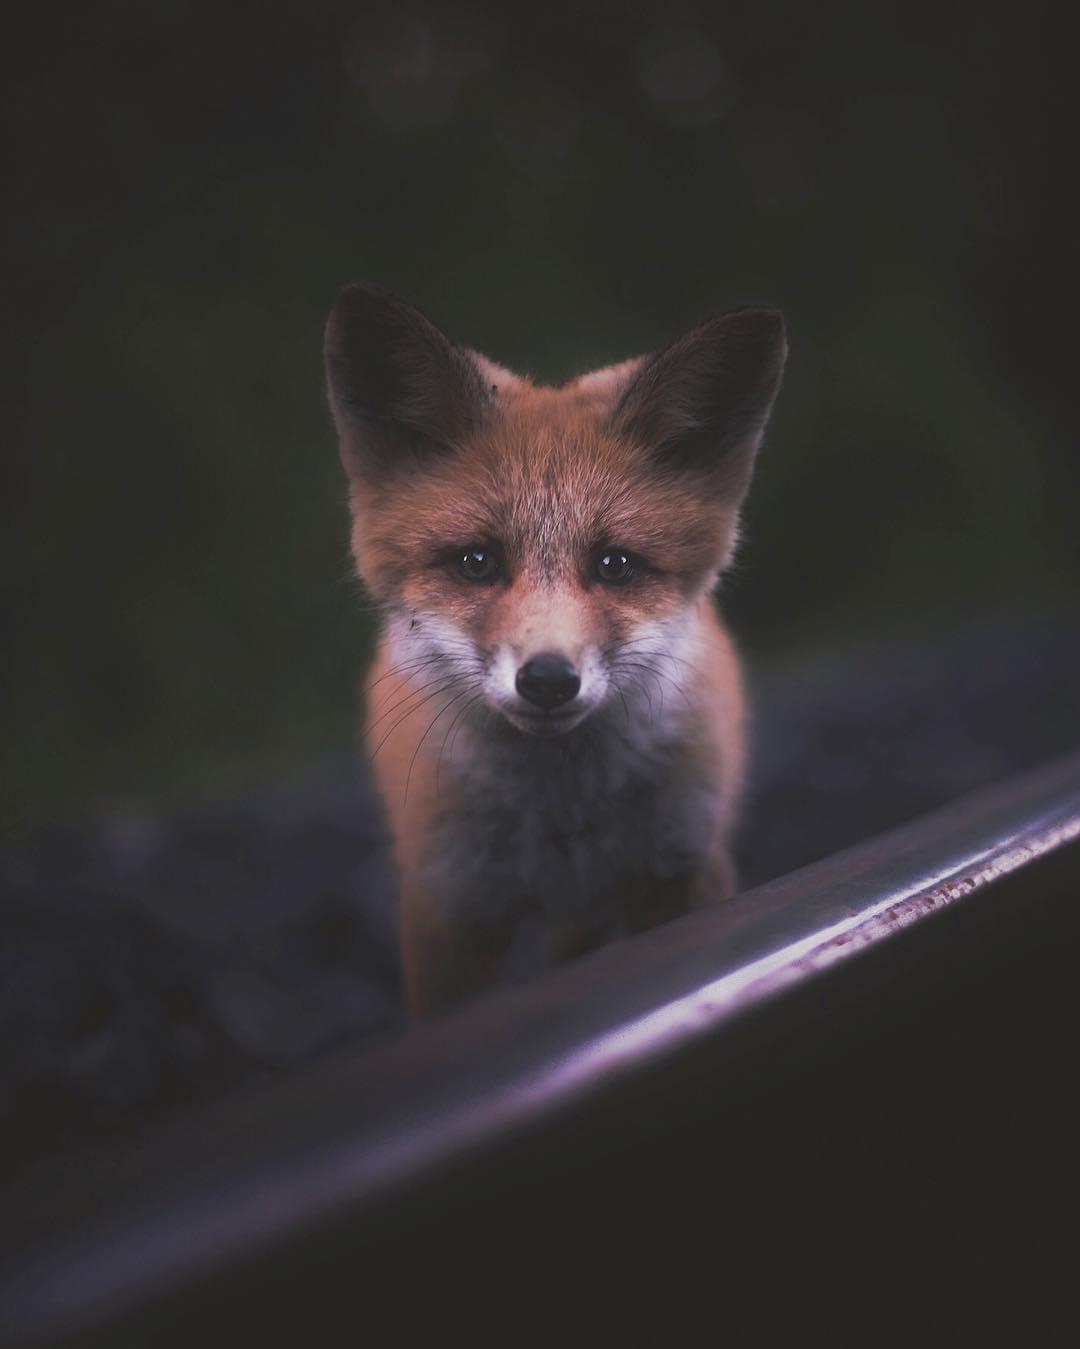 ritratti-ravvicinati-animali-foresta-konsta-punkka-03